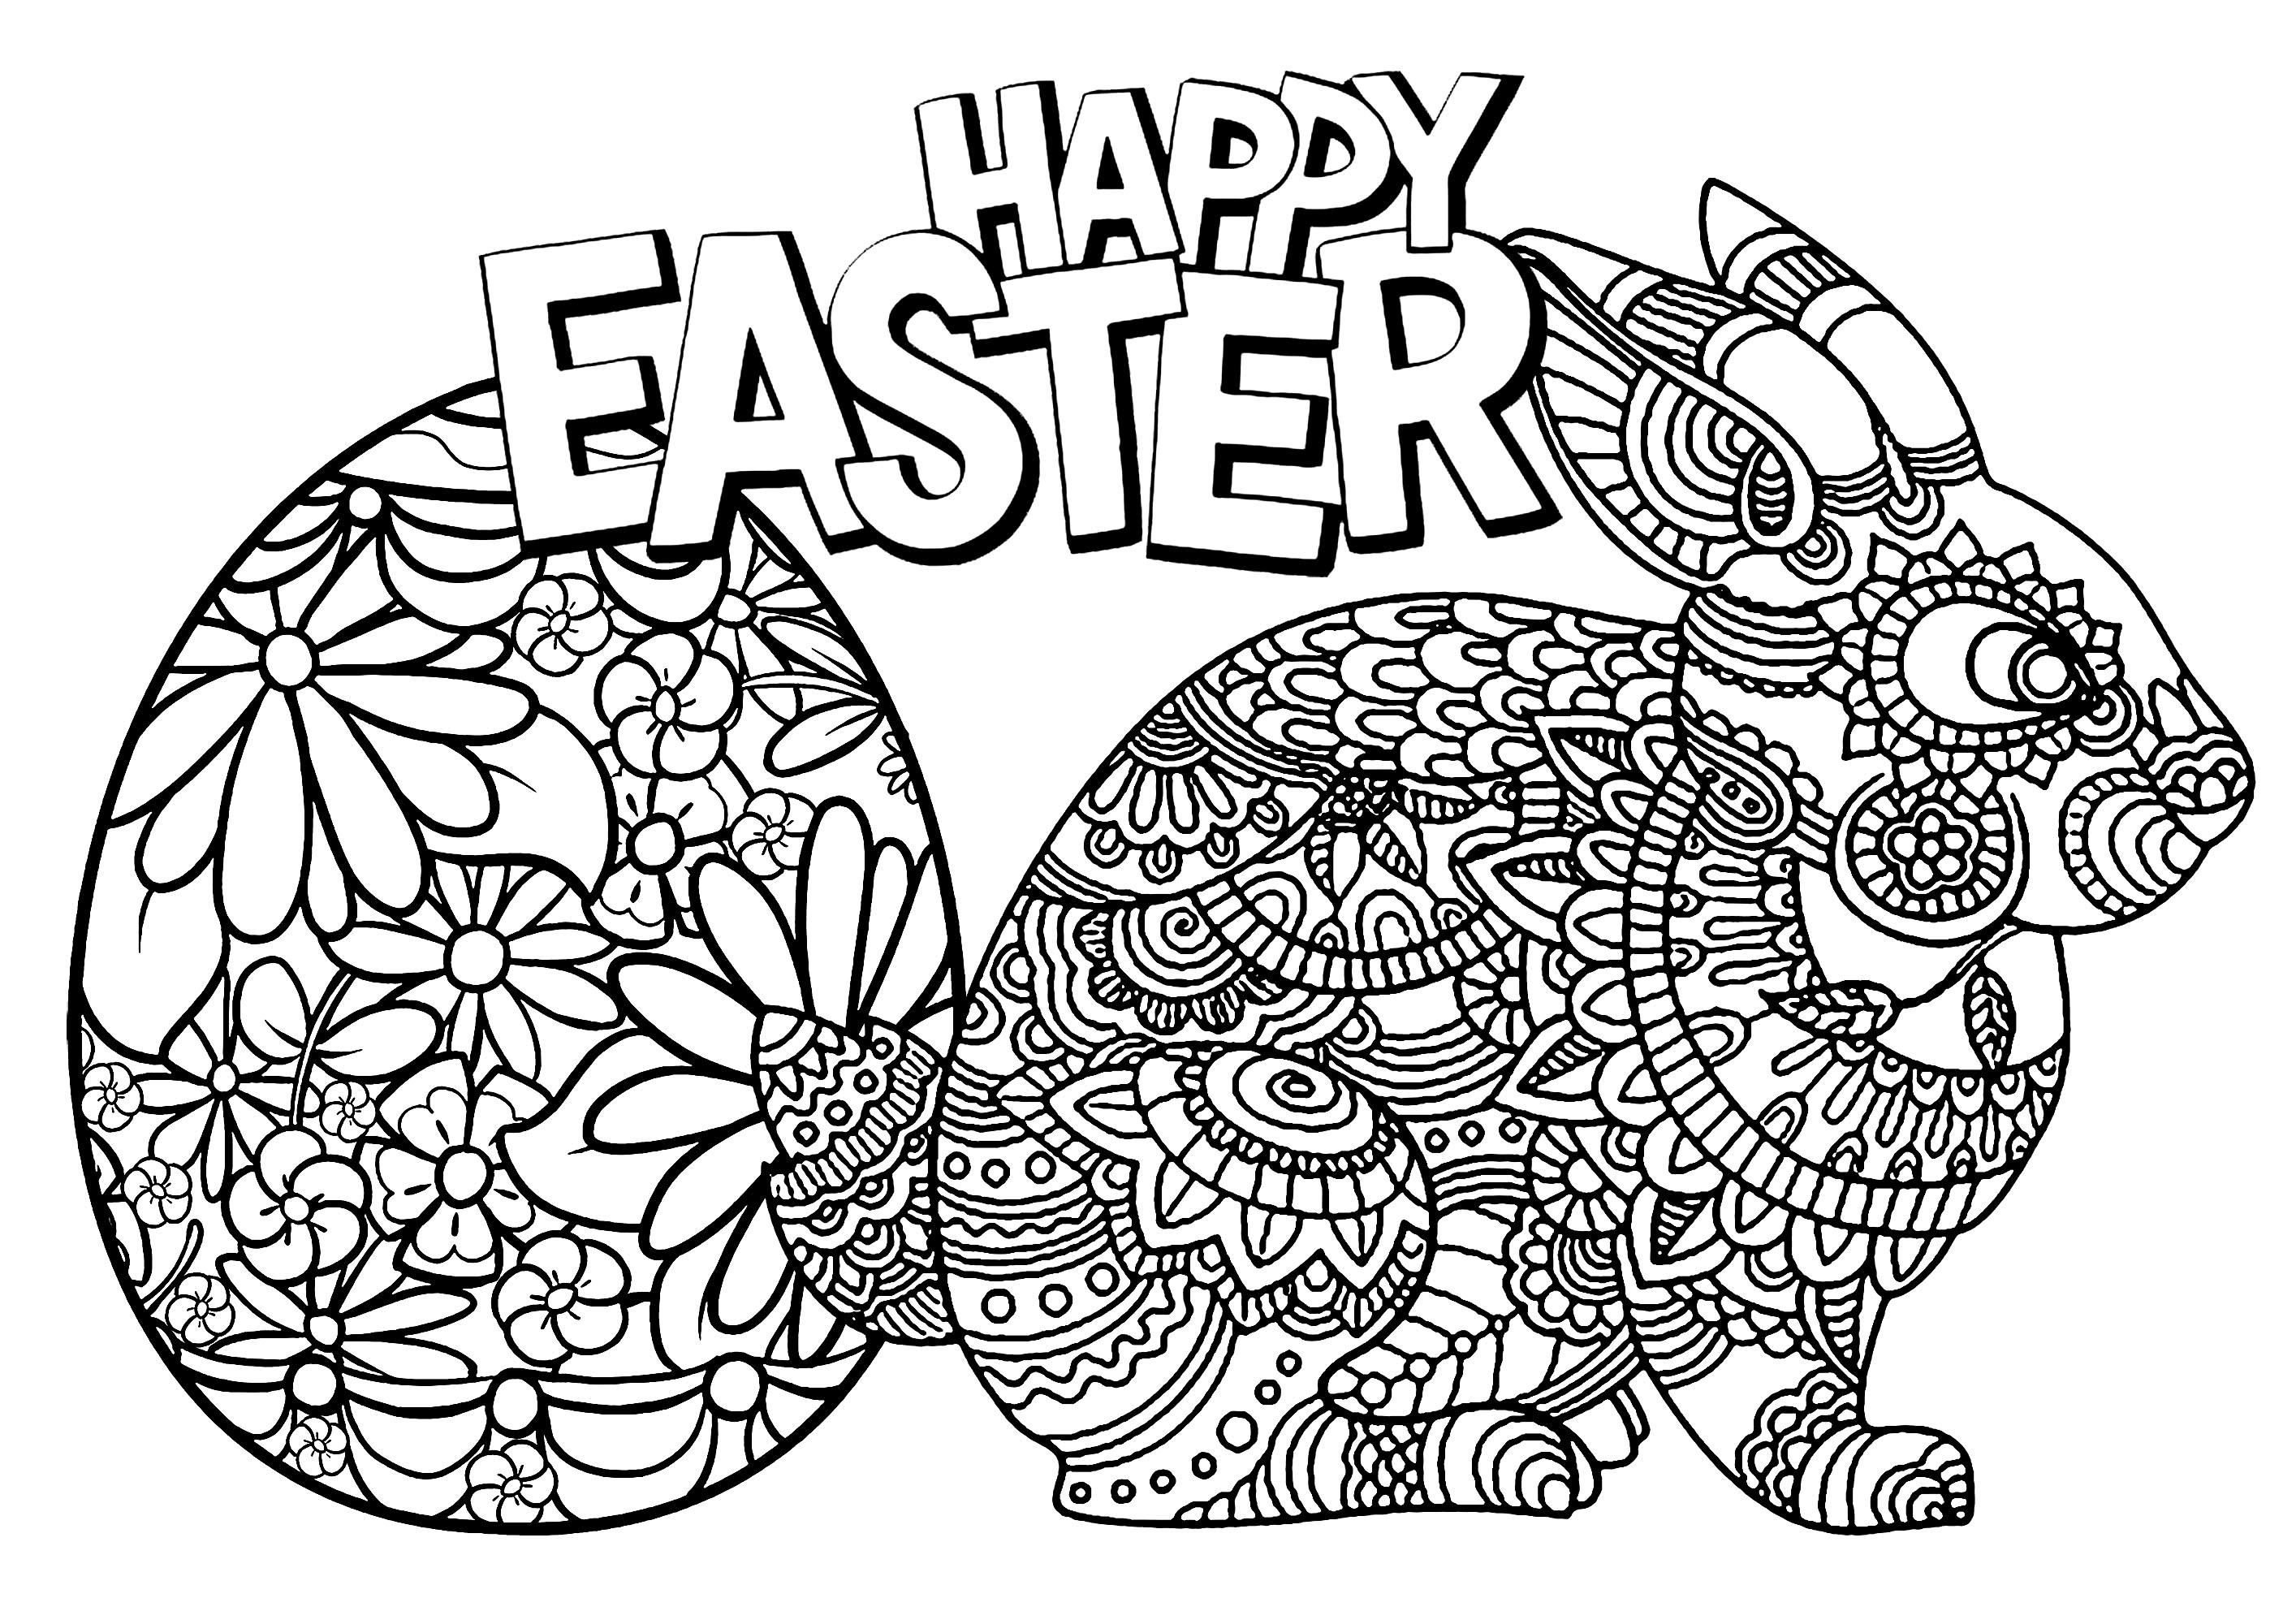 Pascua de resurreccion 27018 - Pascua de Resurrección - Colorear ...